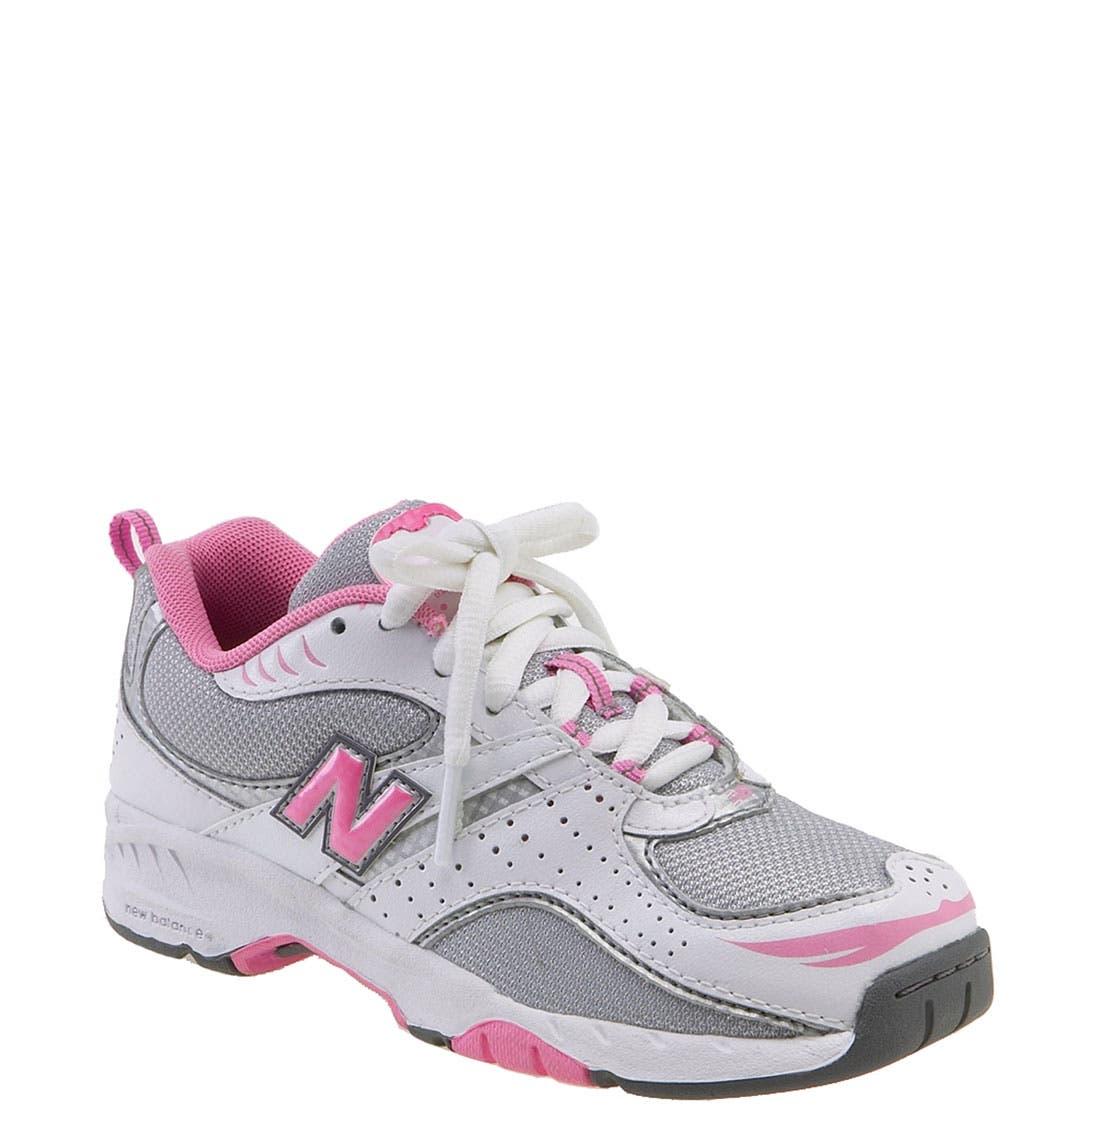 Main Image - New Balance '515' Running Shoe (Toddler, Little Kid & Big Kid)